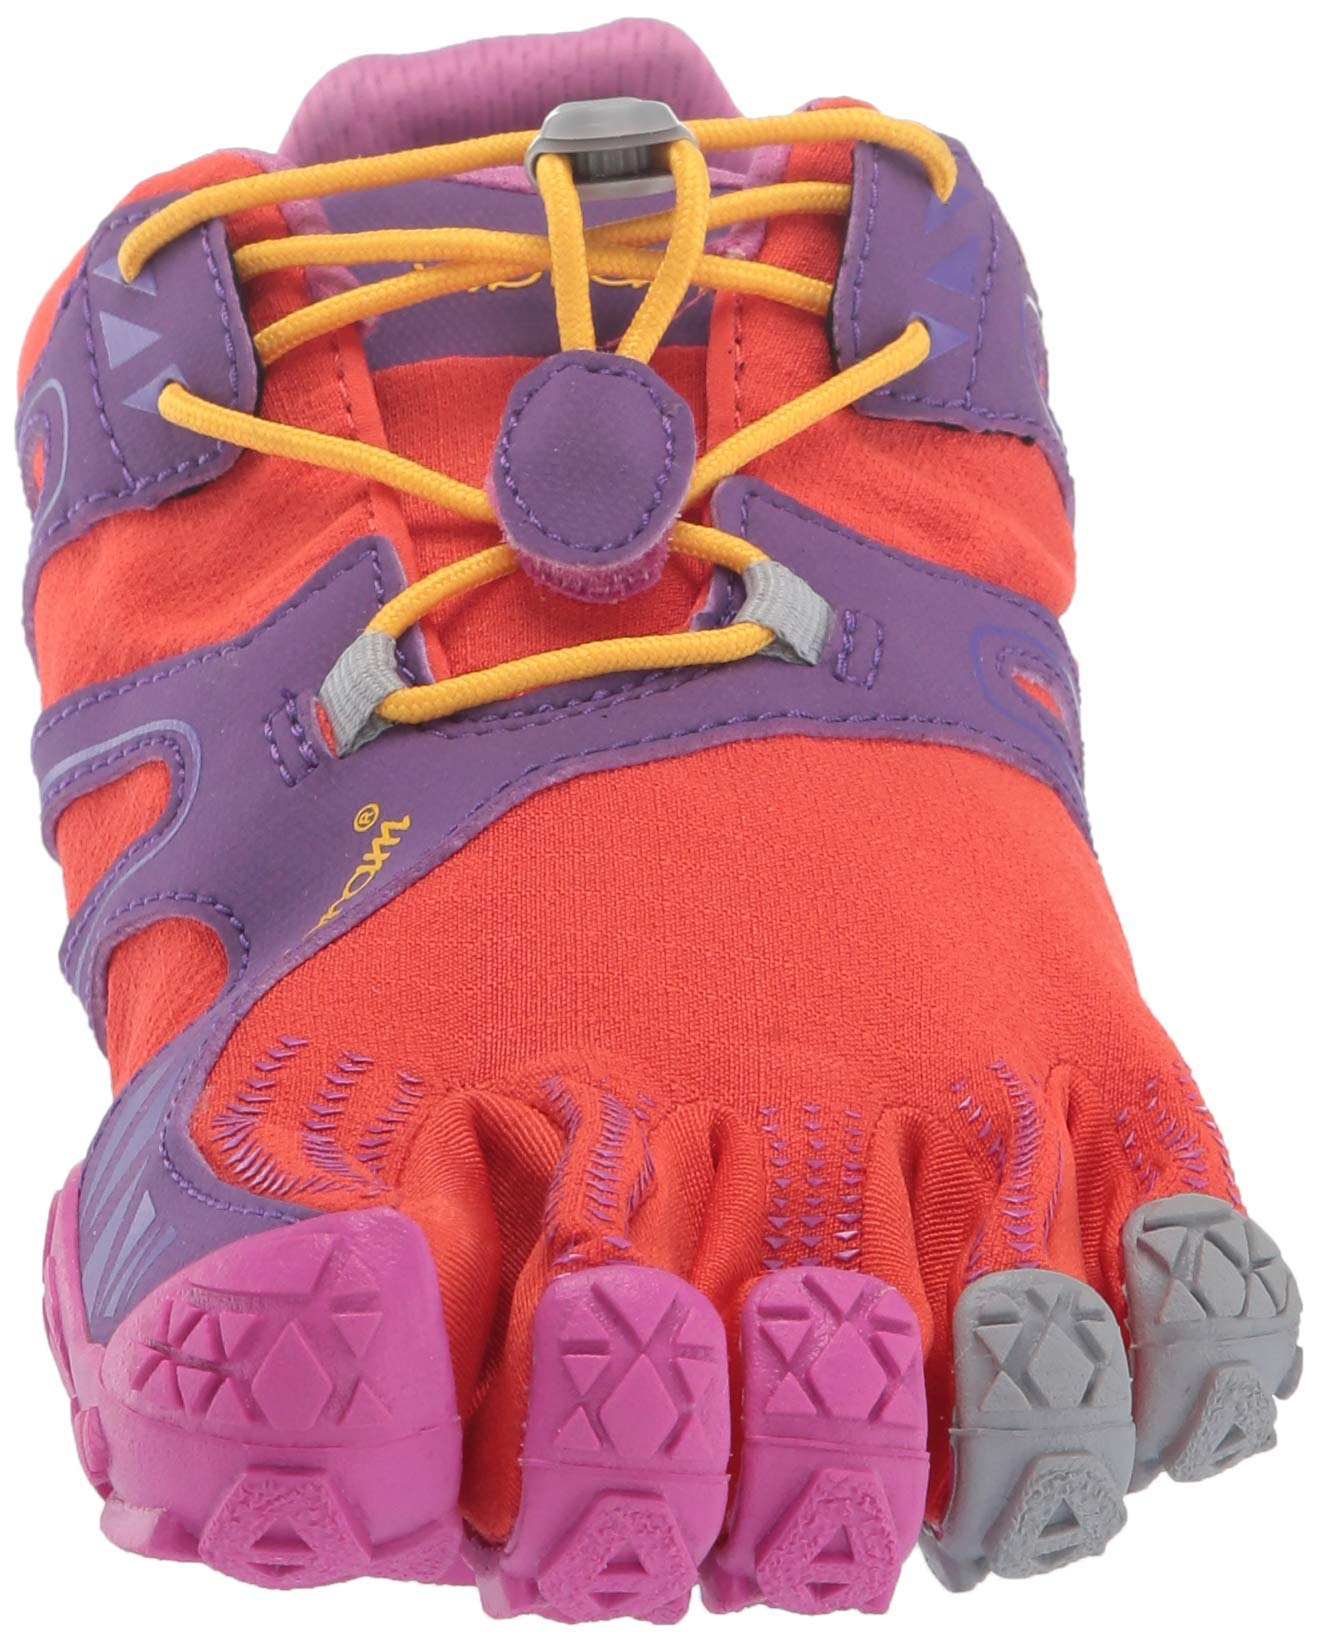 Vibram FiveFingers V-Trail, Women's Trail Running Shoes, Orange (Magenta/Orange), 7.5-8 UK (41 EU) by Vibram (Image #3)